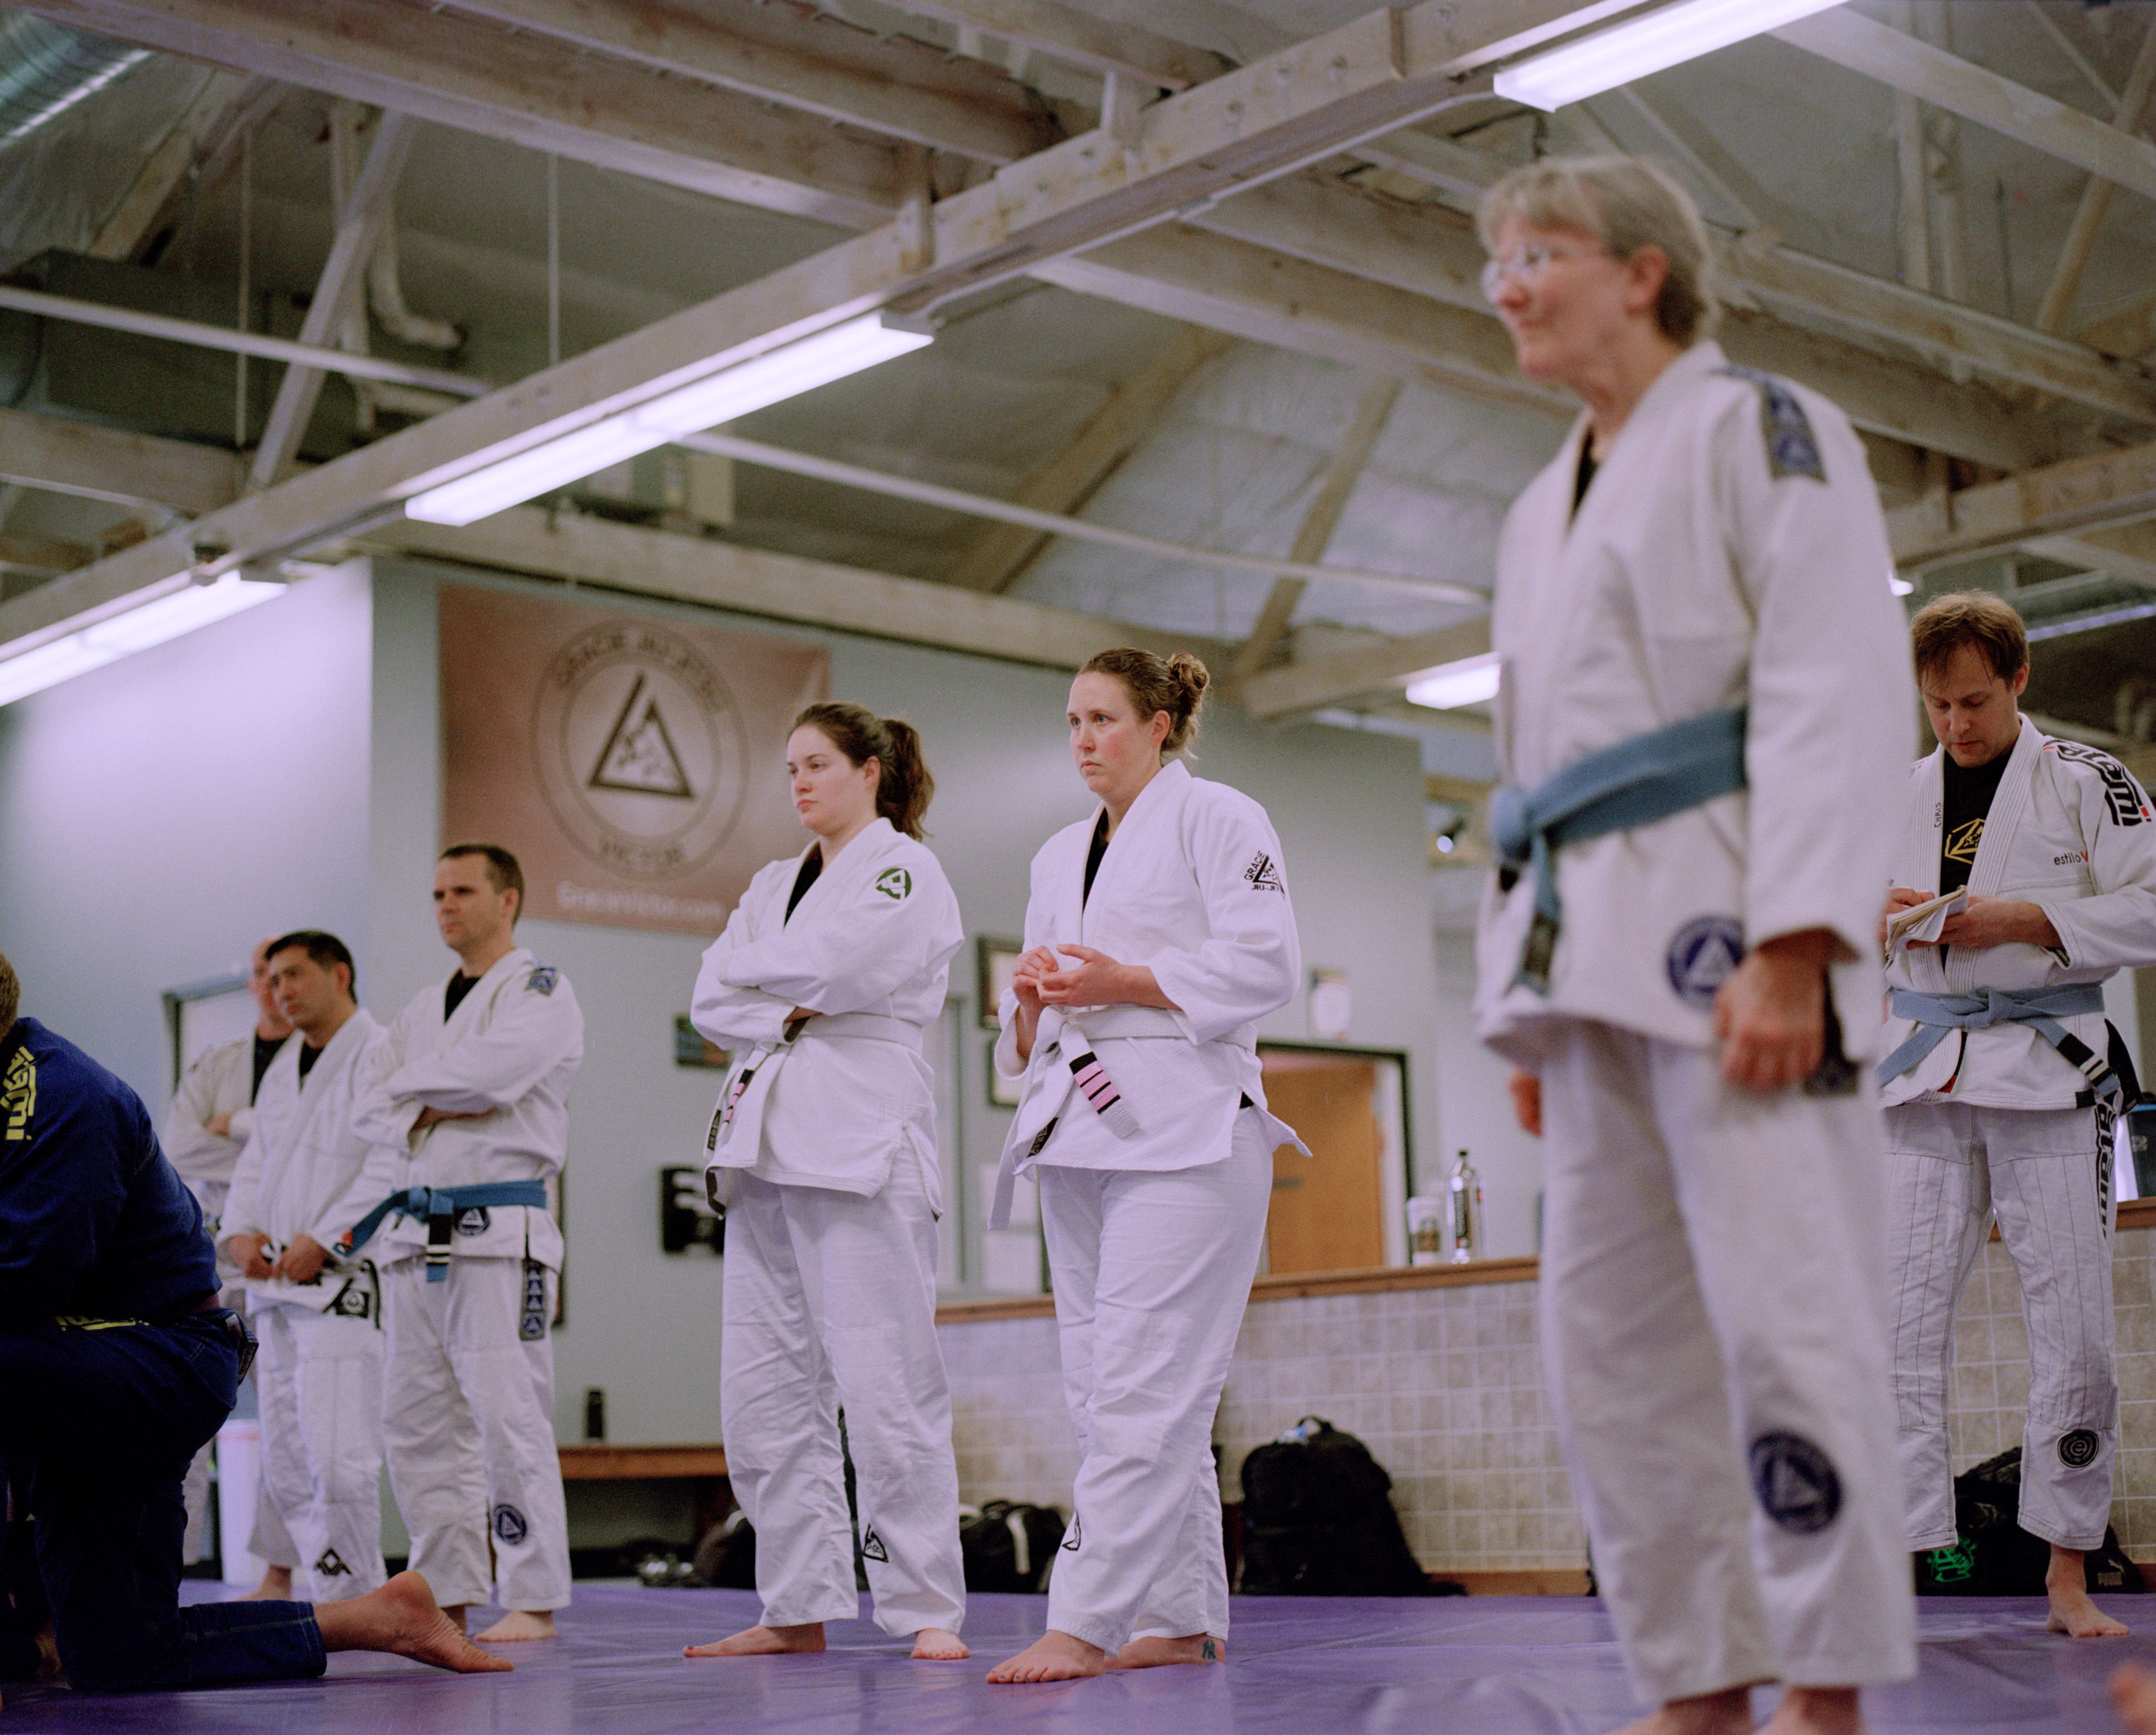 Brazilian juijitsu class near Rochester NY